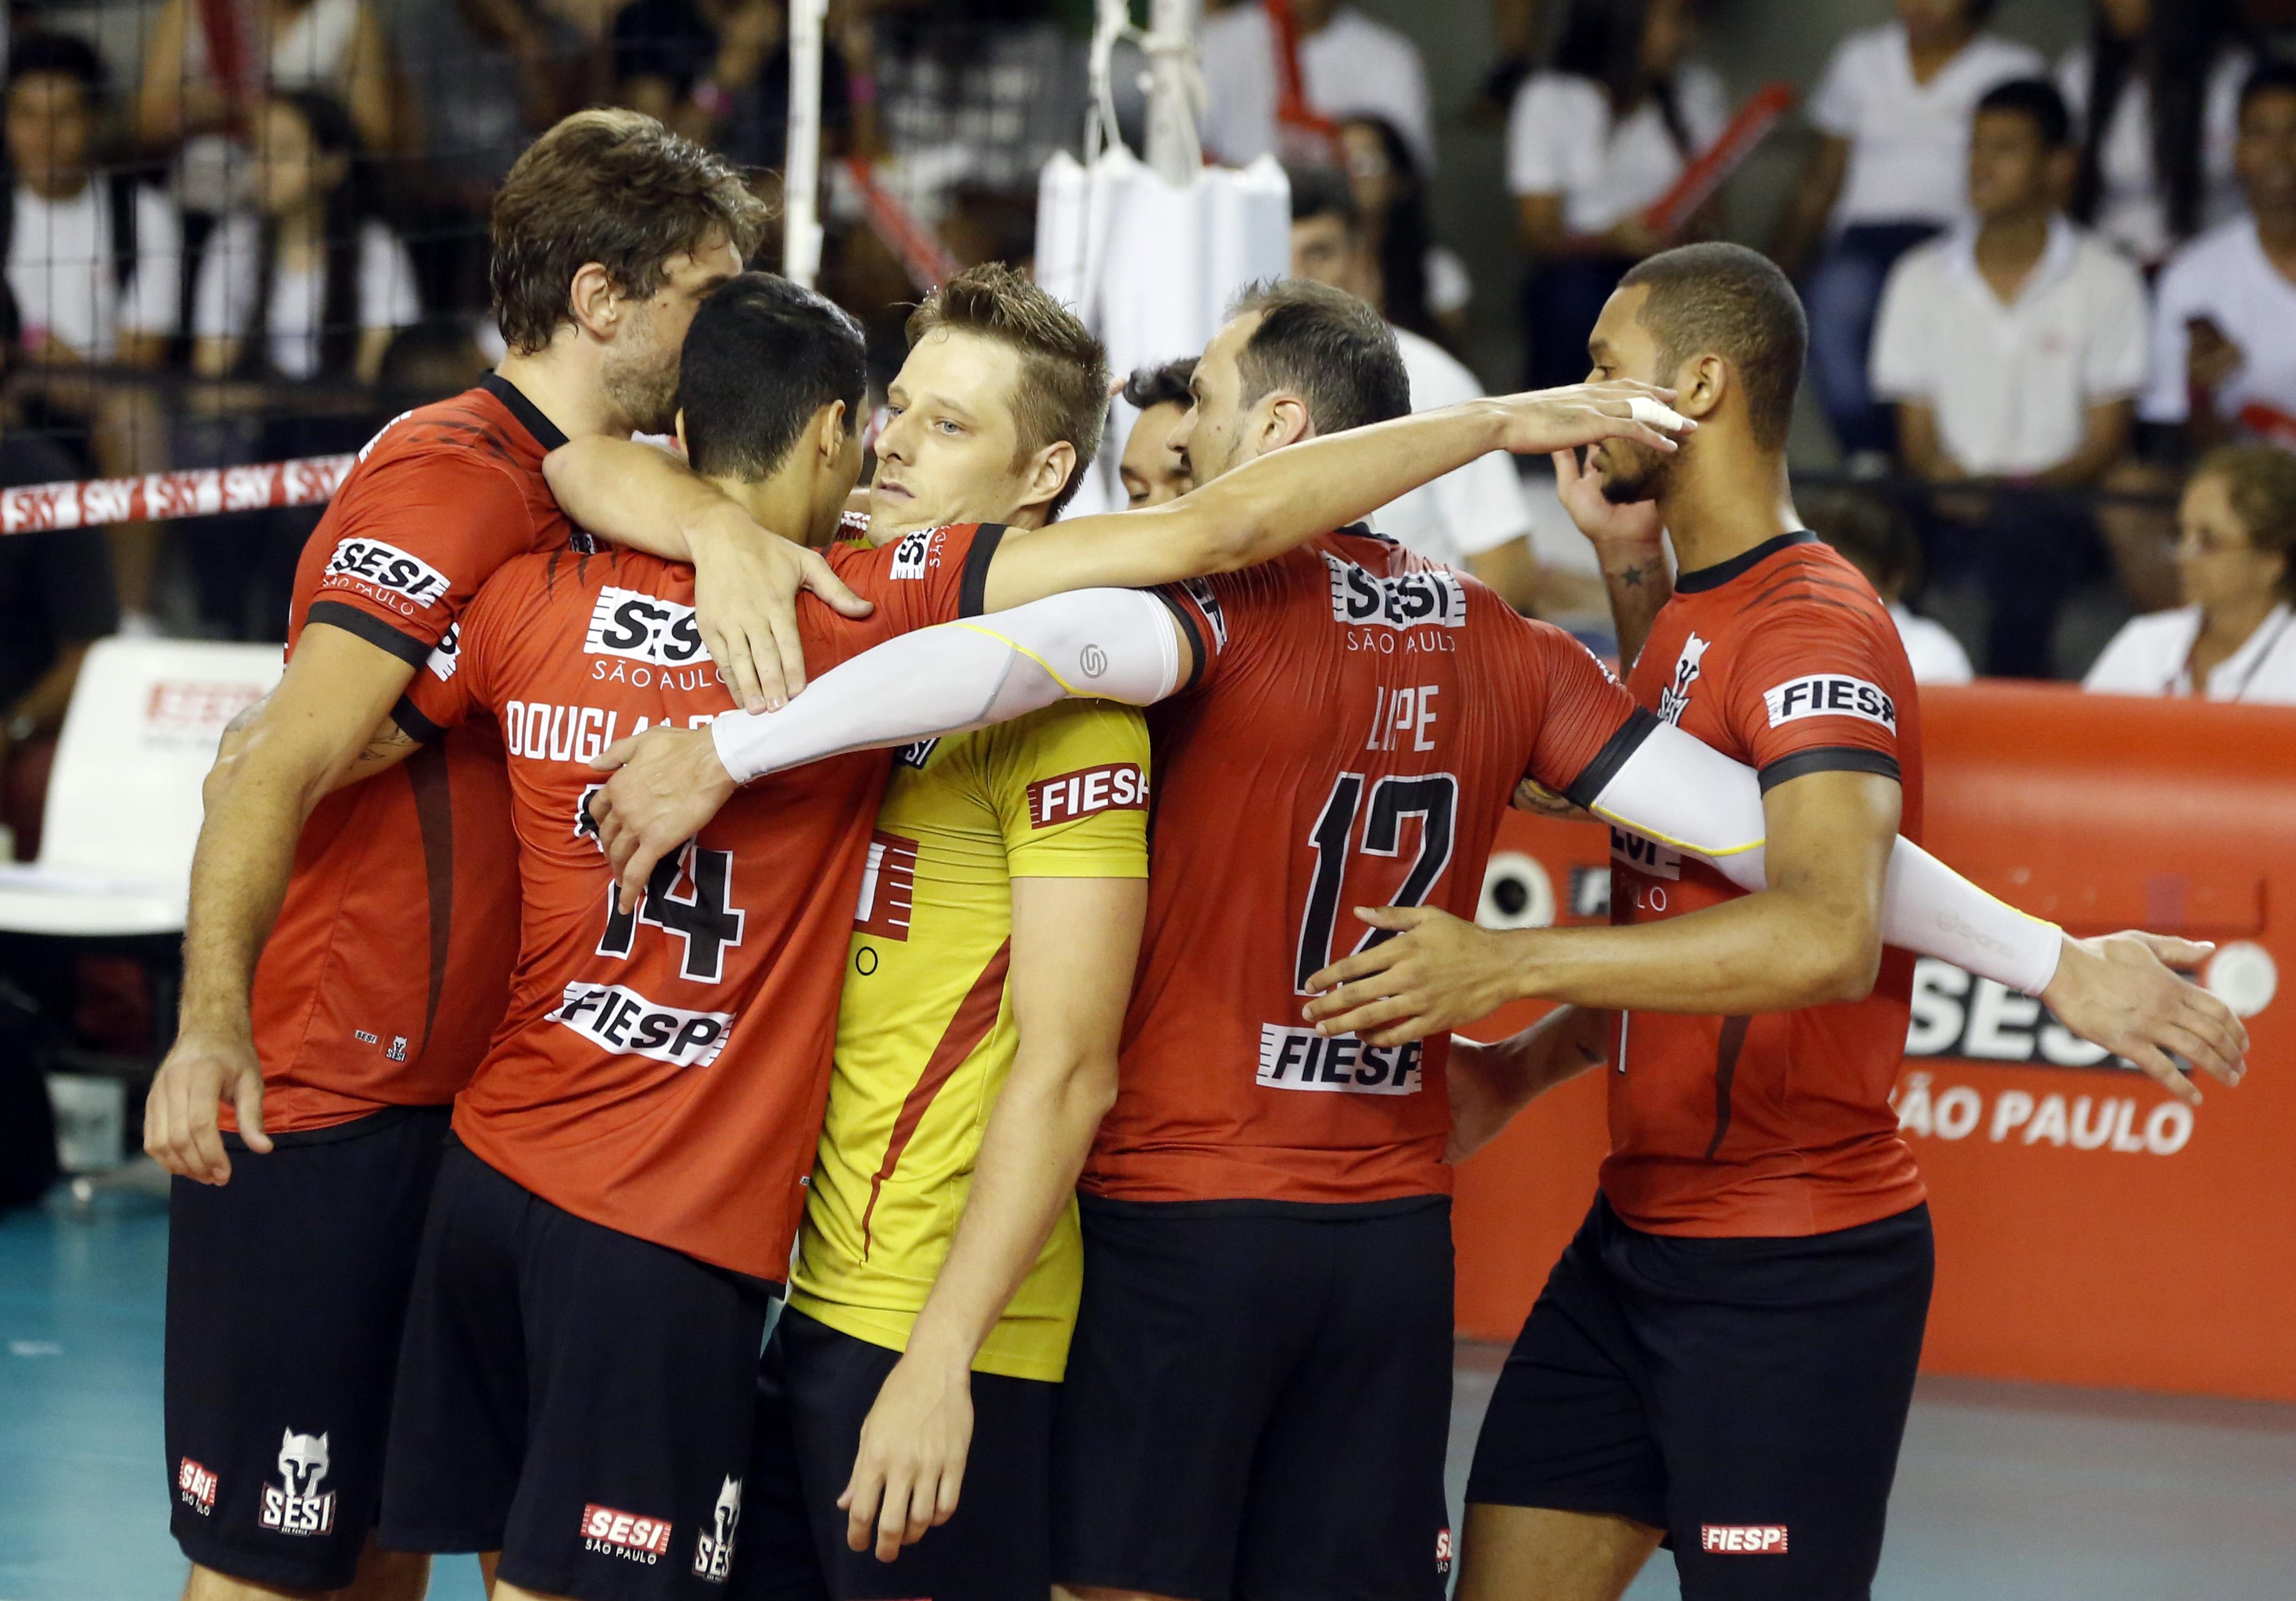 Sesi-SP vence e fará final contra o Sada Cruzeiro